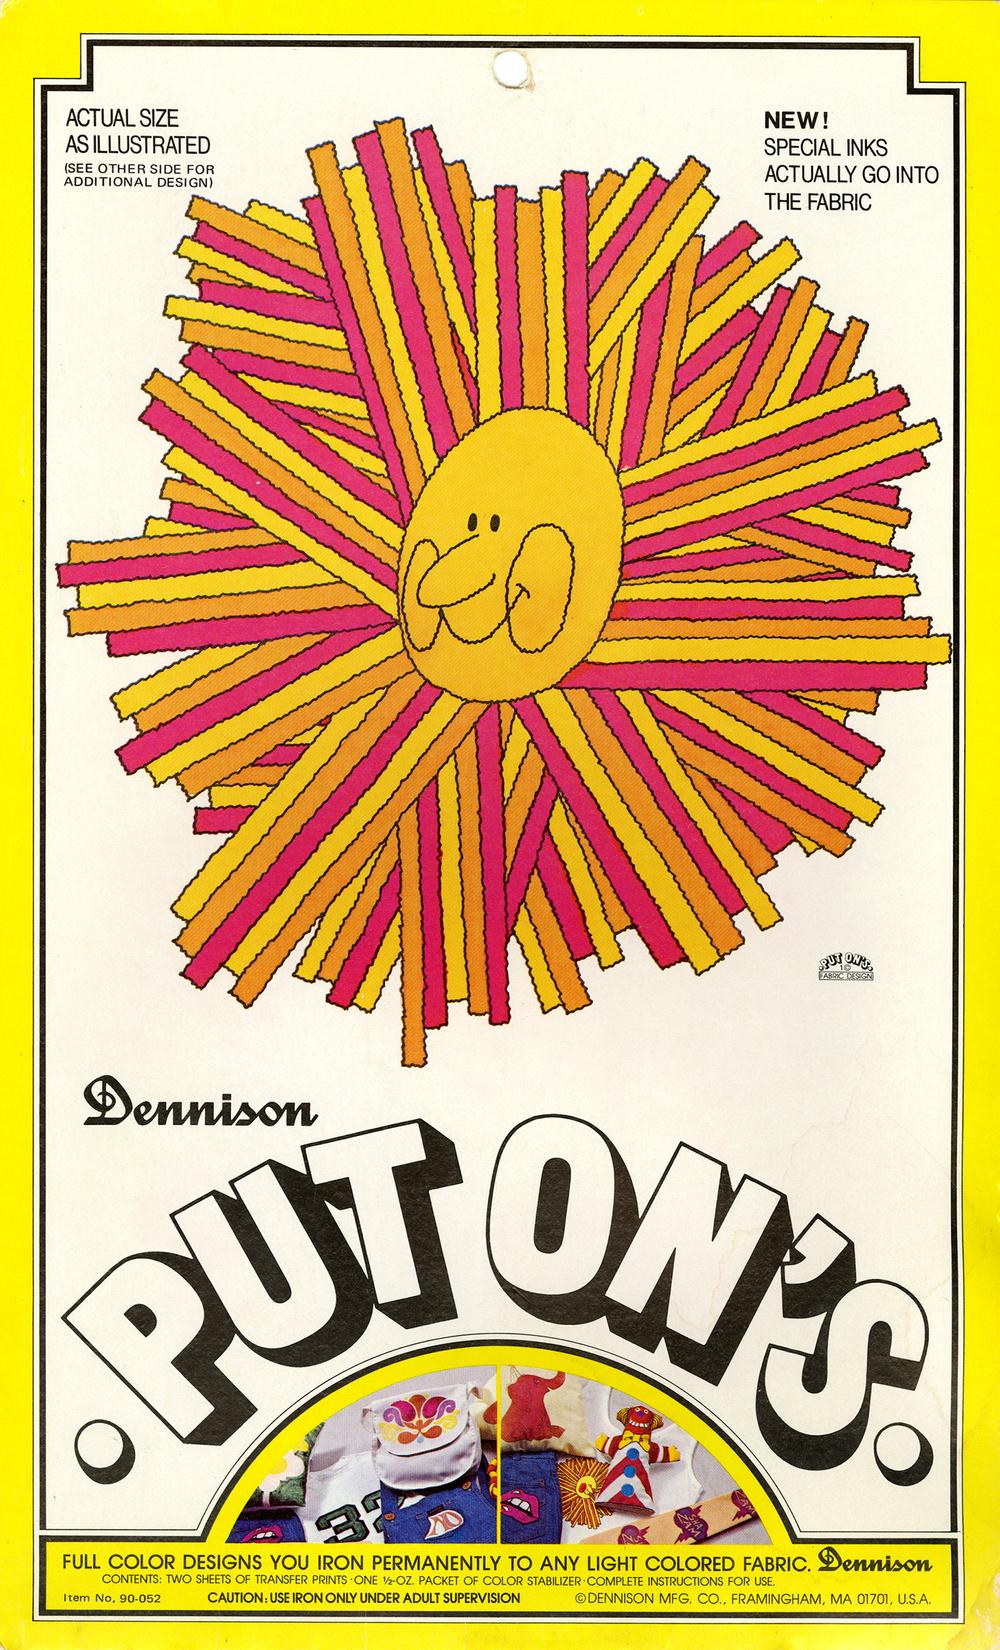 dennison-put-ons_7.png